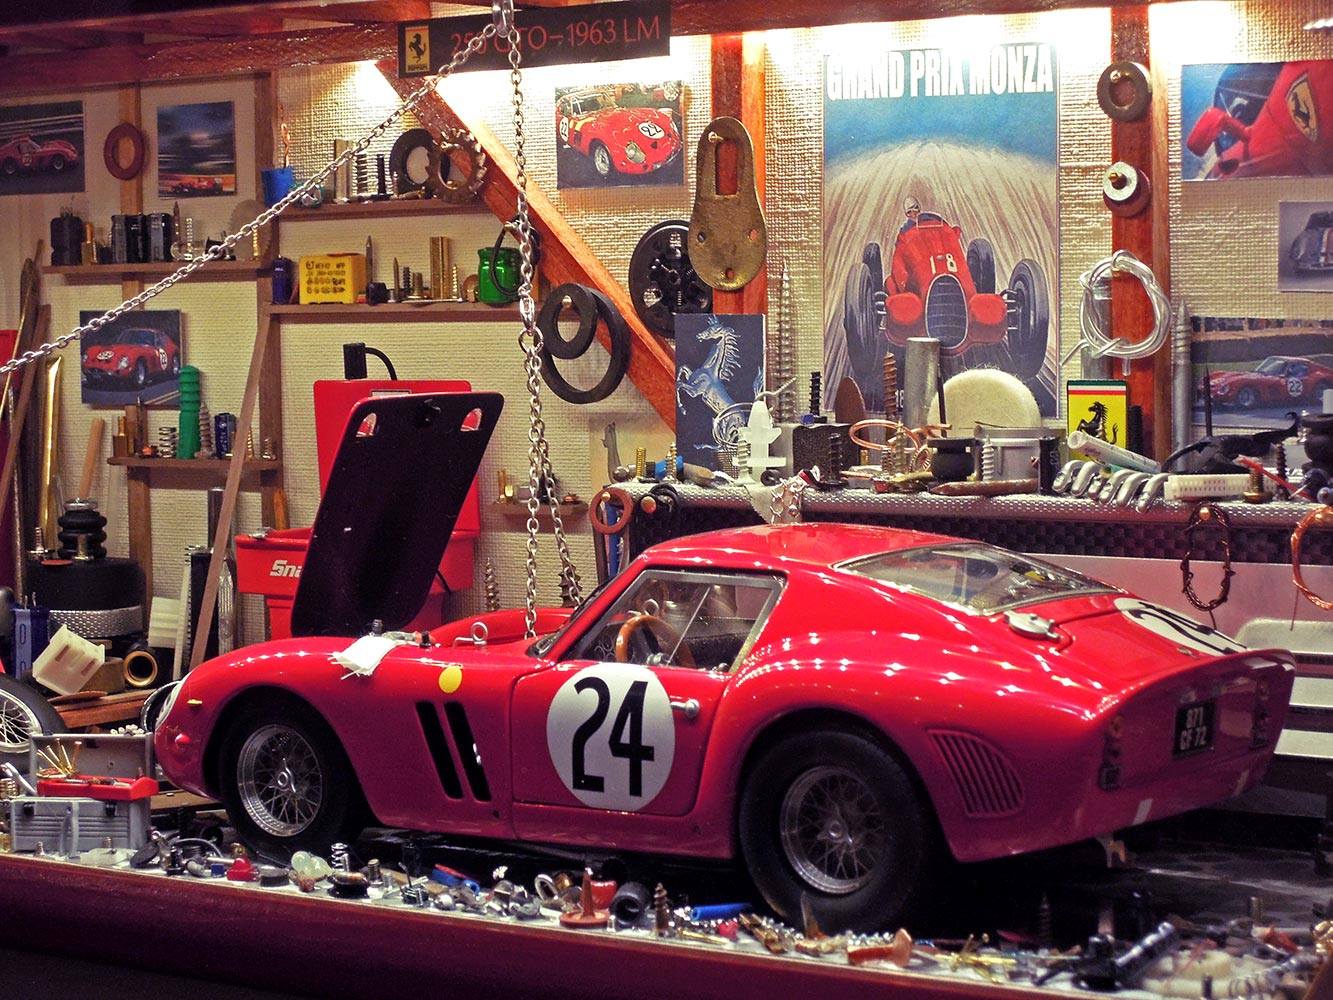 Ferrari-230-GTO-1963-LM-6